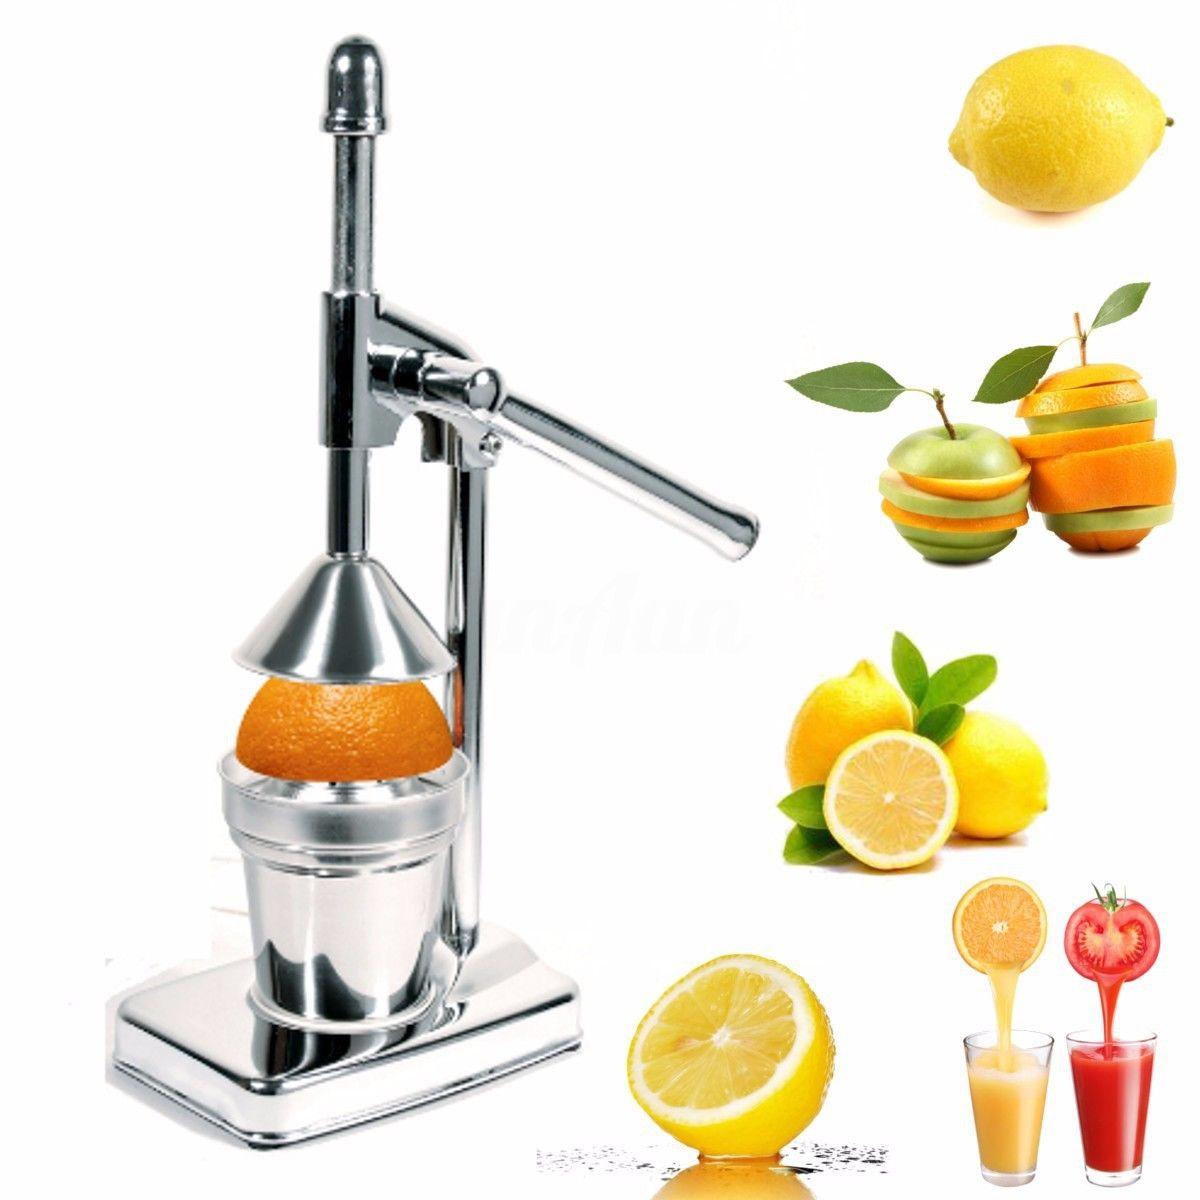 Manual Orange Juicer Lemon Juice Fruit Squeezer Extractor Hand Kitchen Tool V